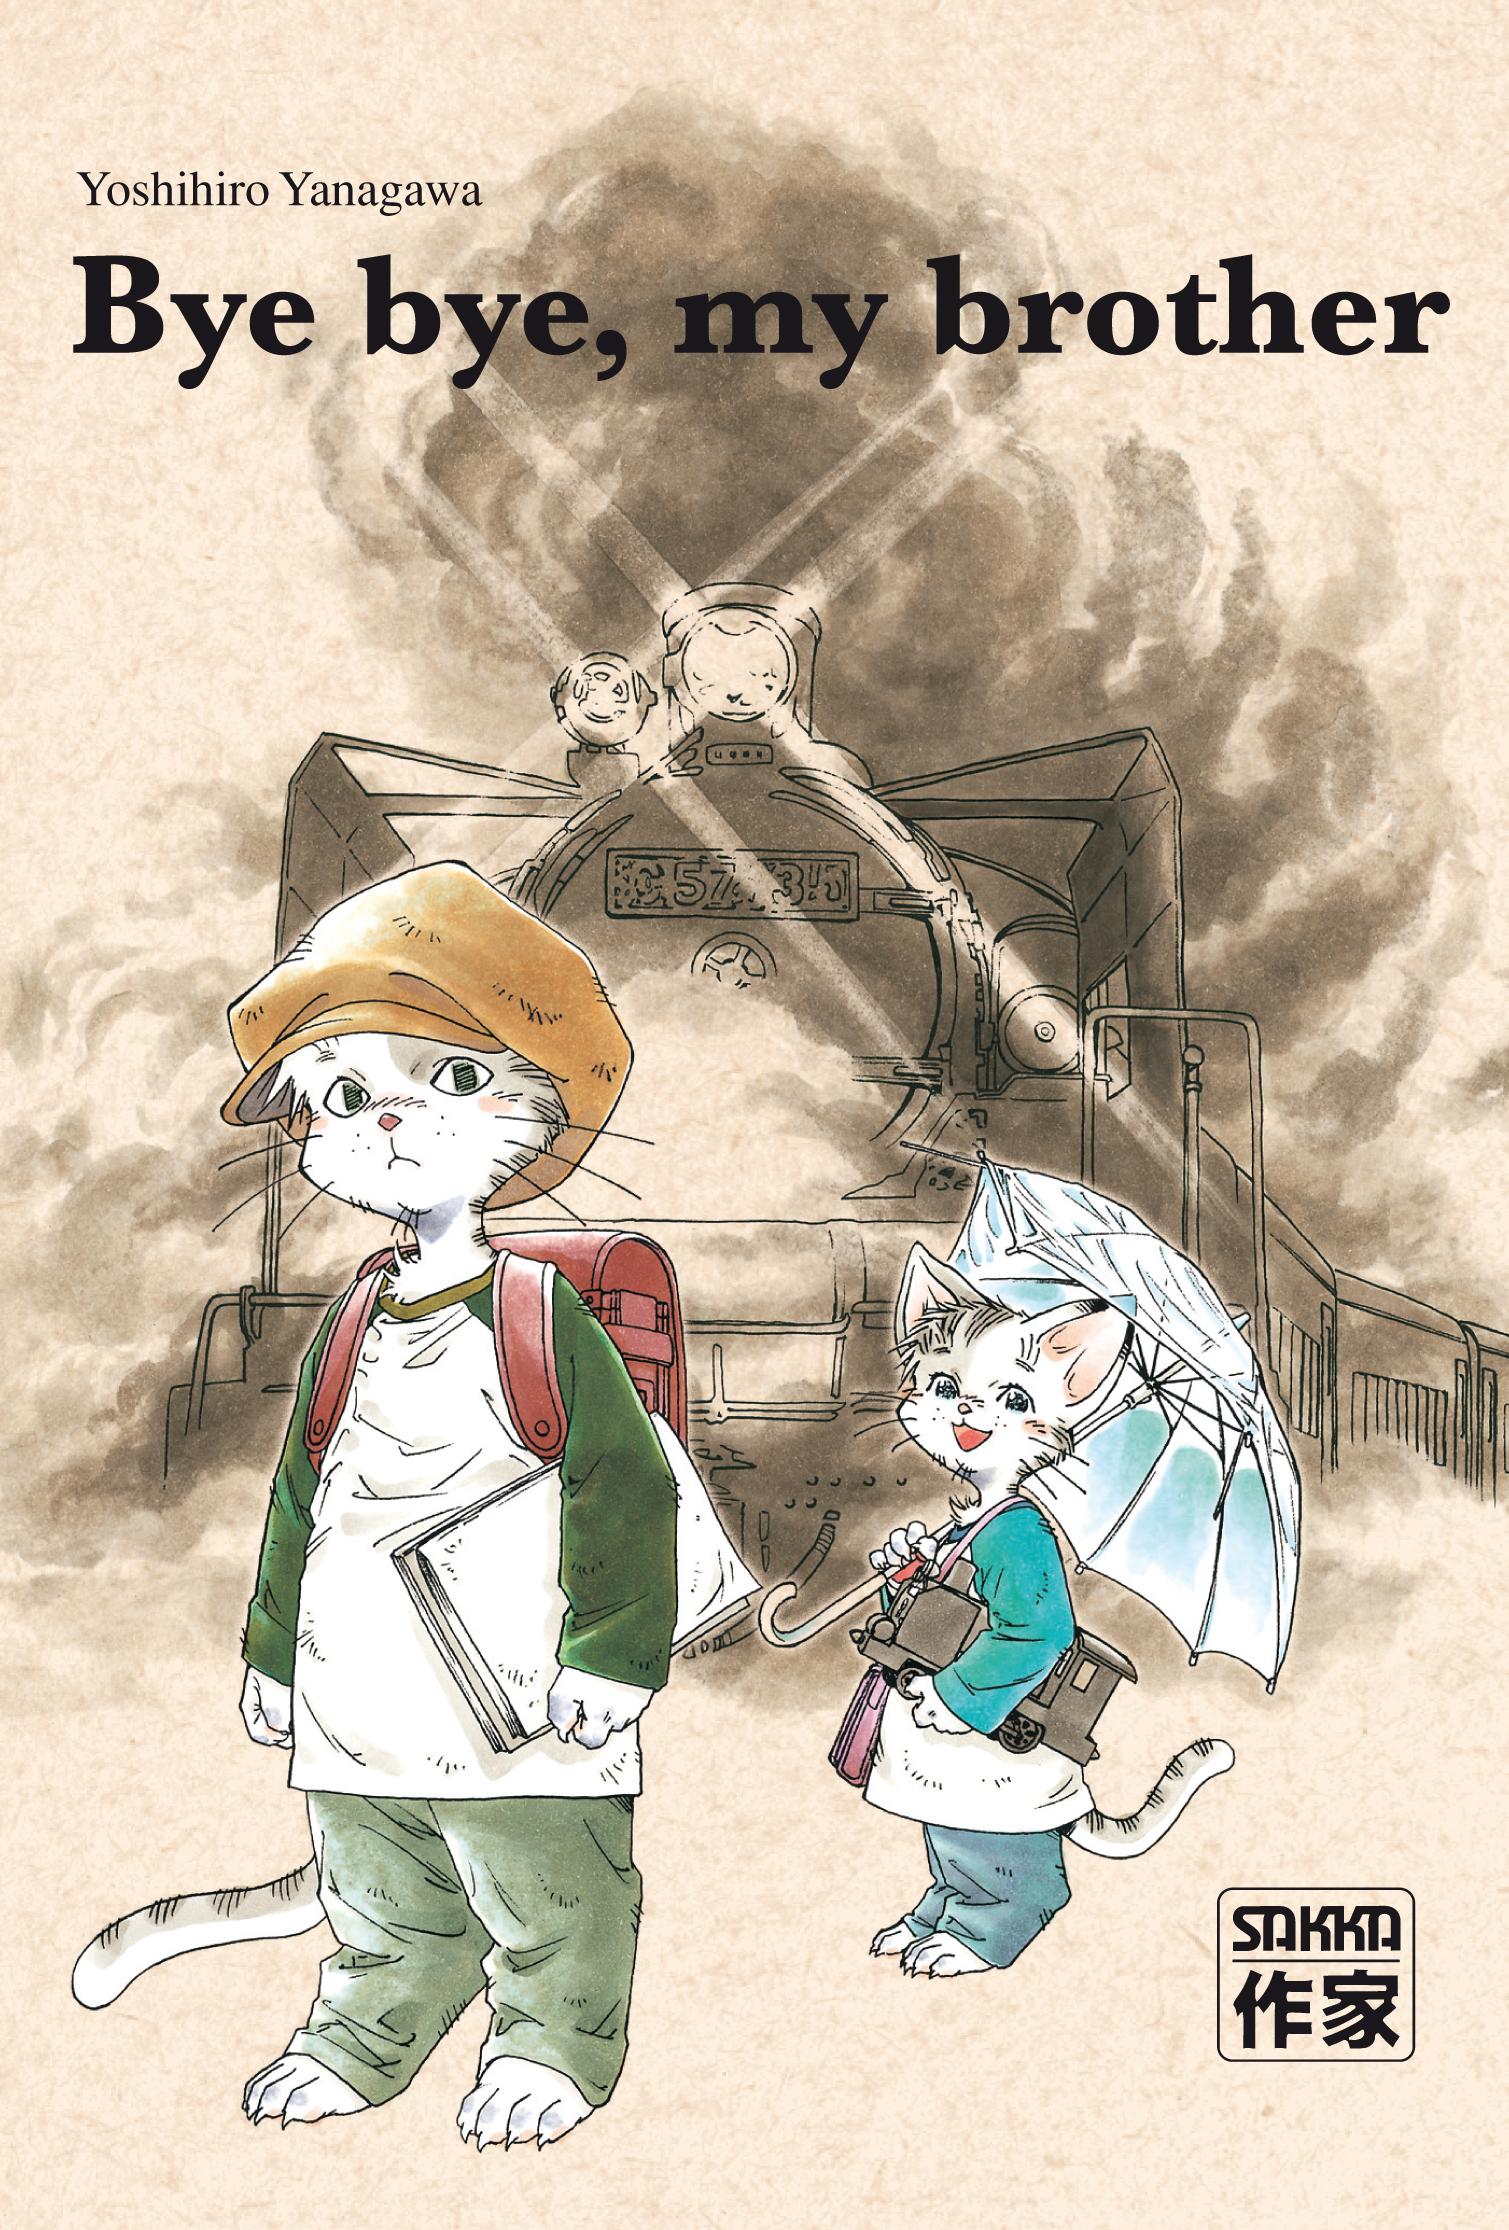 http://img.manga-sanctuary.com/big/bye-bye-my-brother-manga-volume-1-simple-65358.jpg